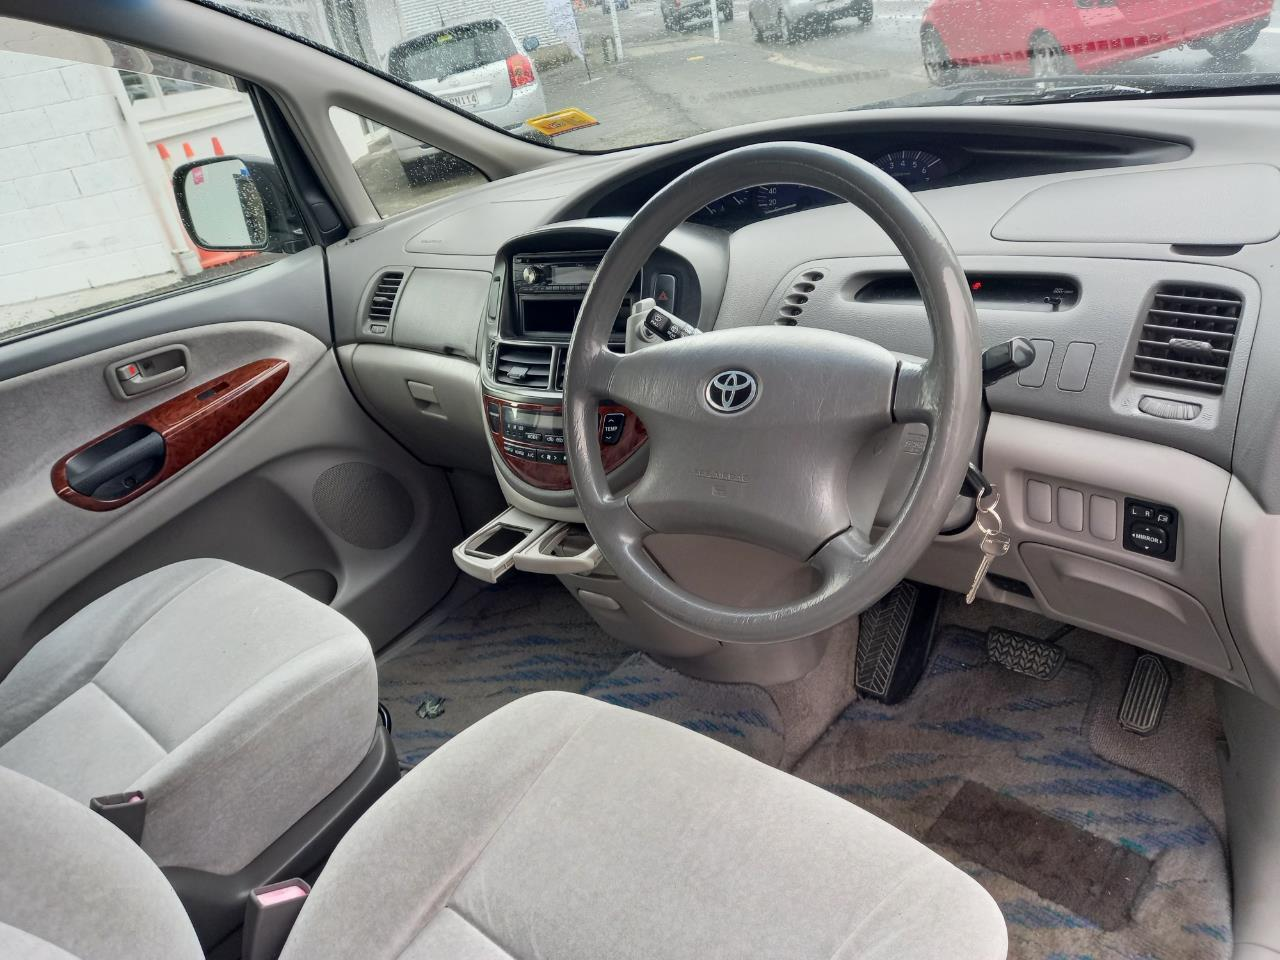 image-14, 2001 Toyota Estima 8 Seats No Deposit Finance at Dunedin